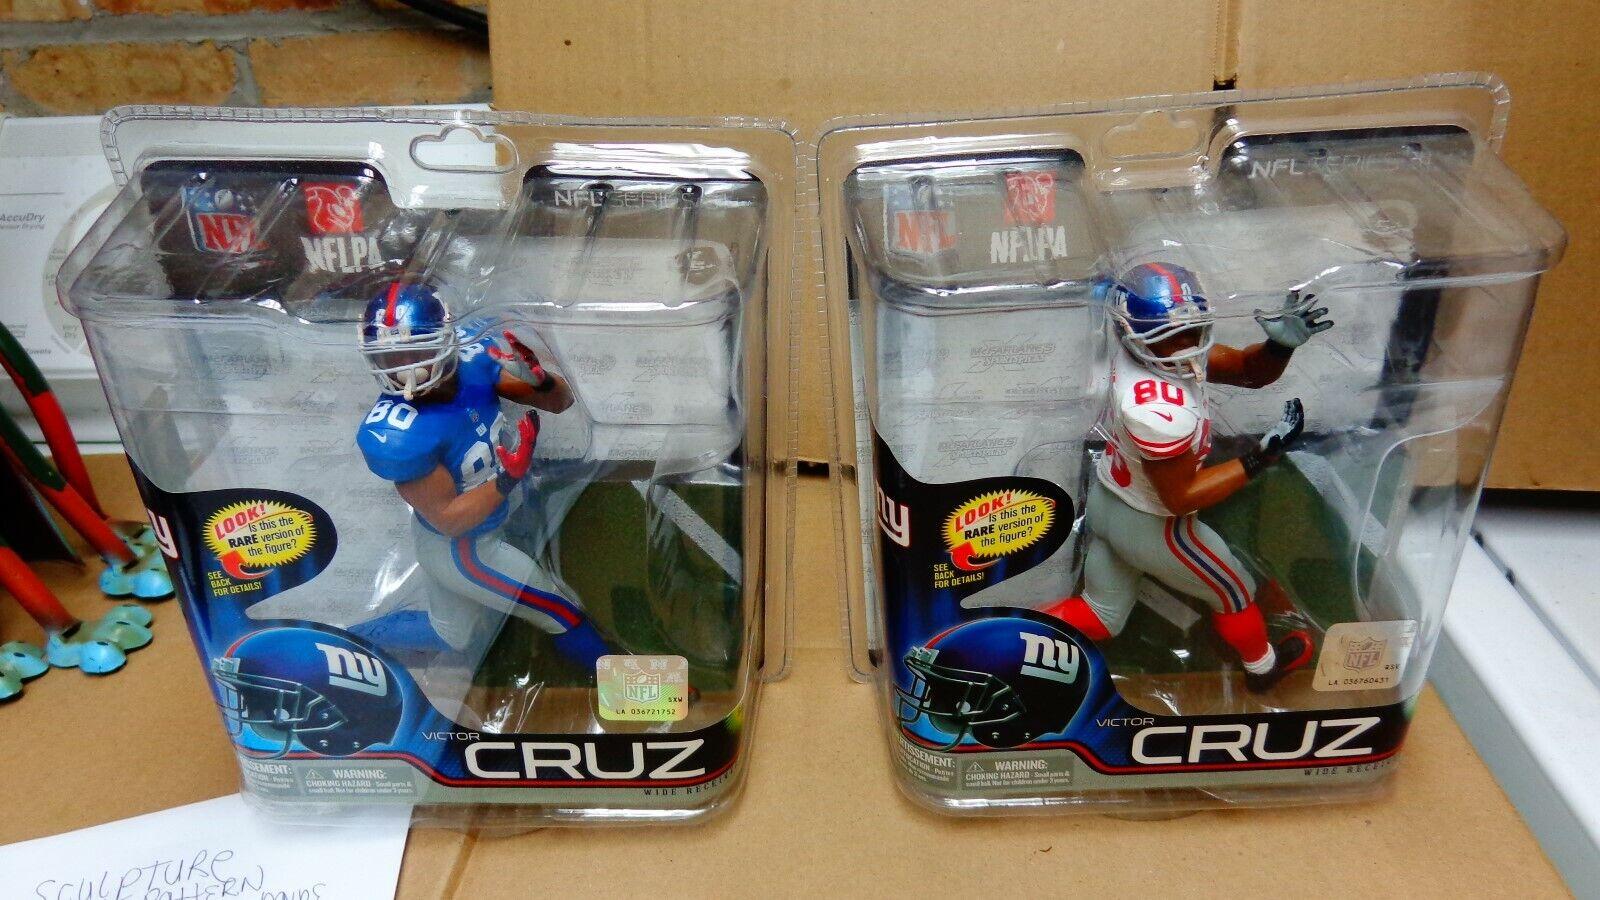 MCFARLANE VICTOR  CRUZ NY GIANTS WR NFL31 cifra(SETOF2) REG e CL 2000 nuovo  vendita online sconto prezzo basso